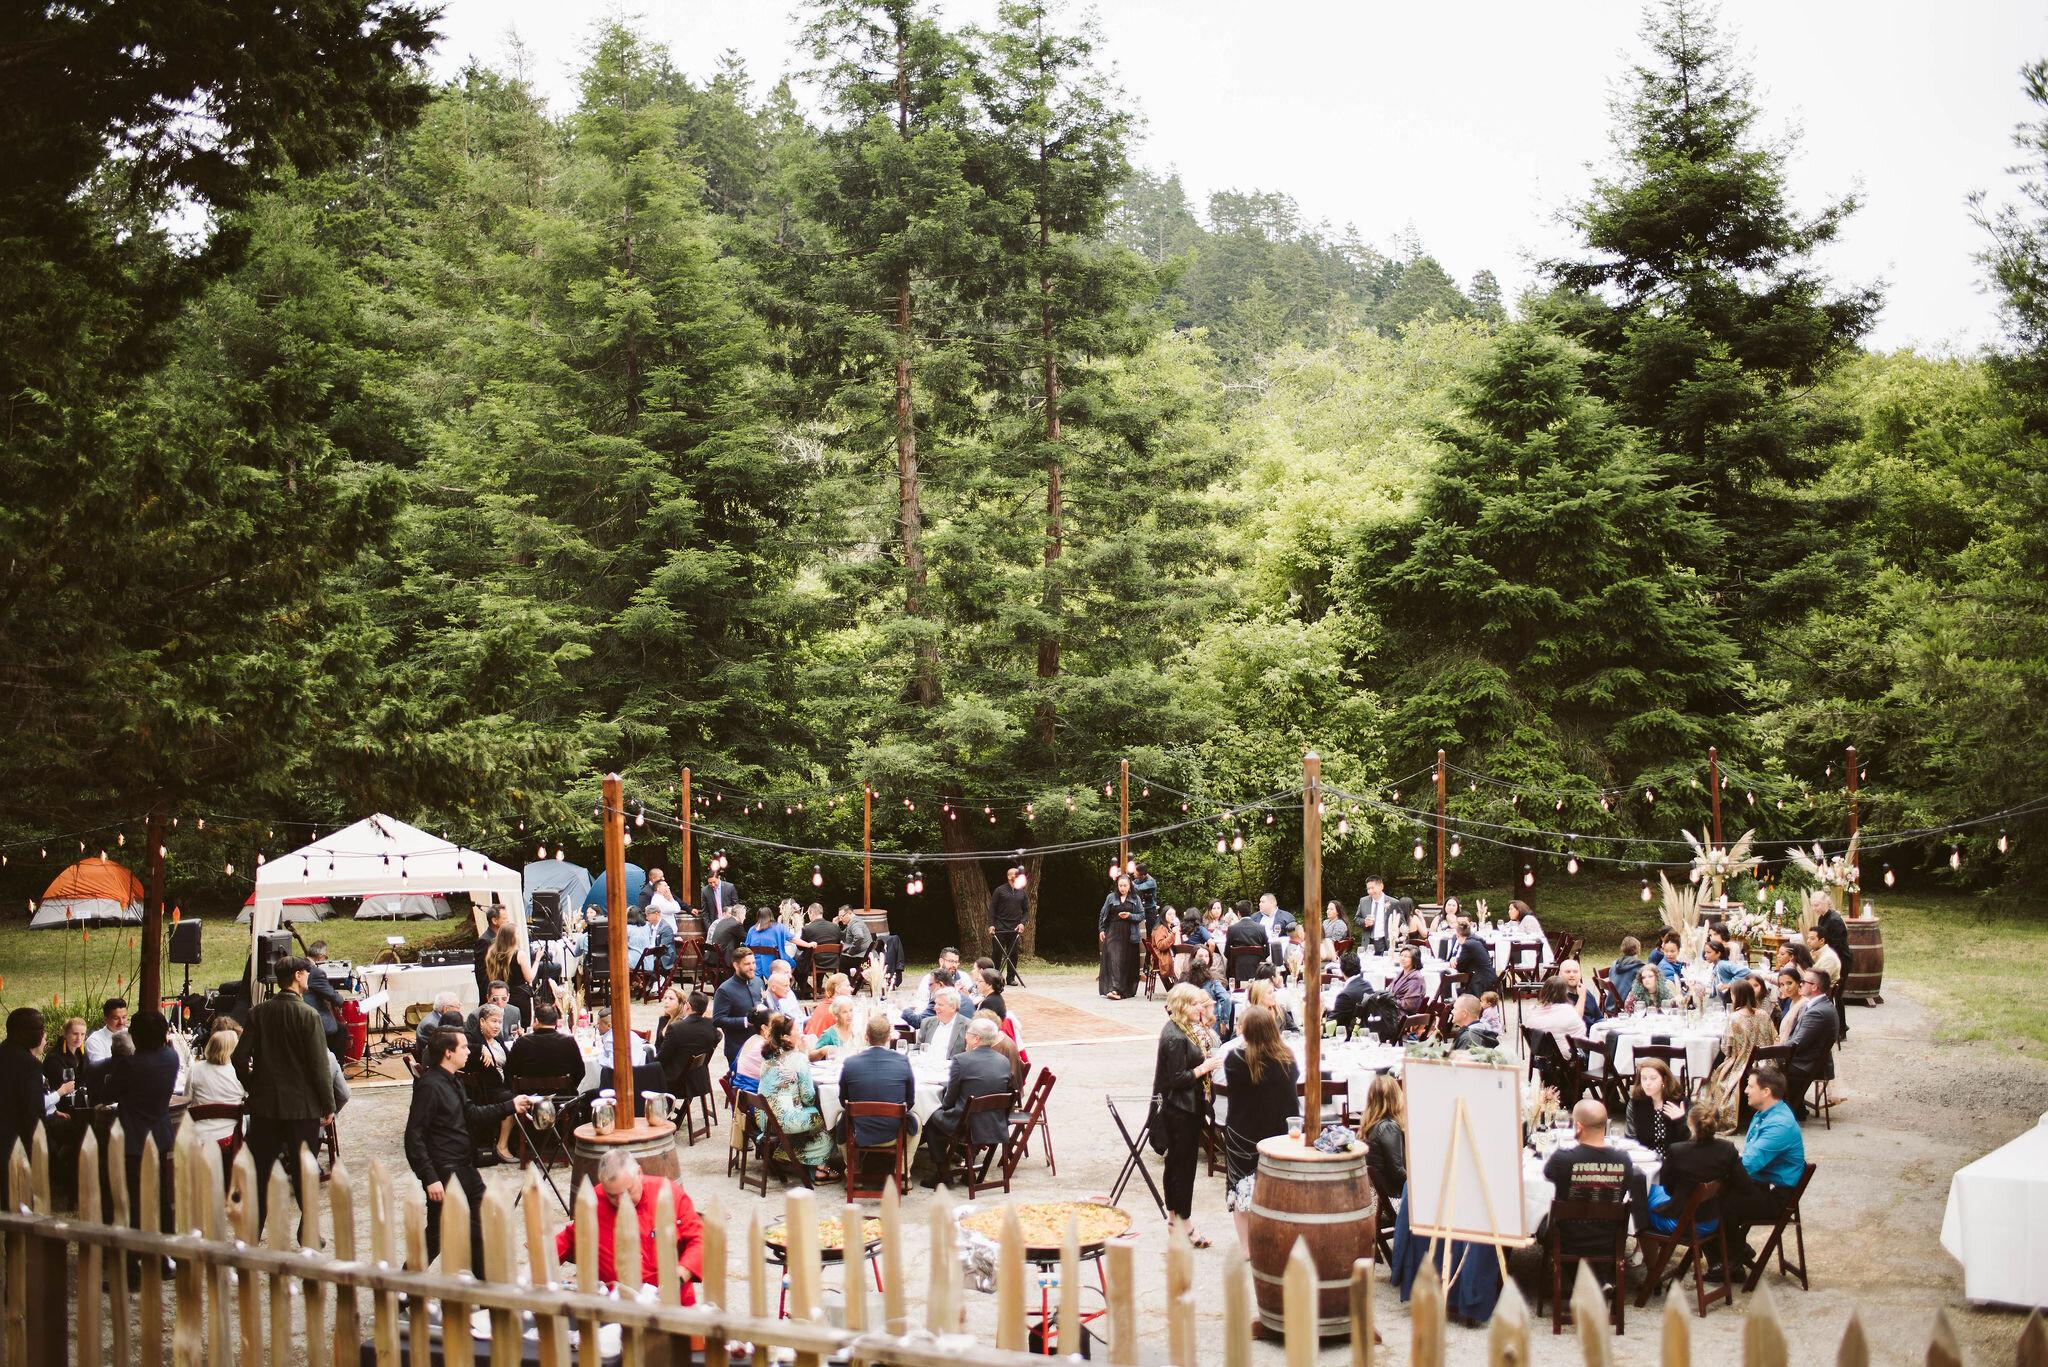 Venture-Retreat-Center-Wedding-Pescadero-Sat-Aaron-Pritam-The-Shalom-Imaginative-541.jpg